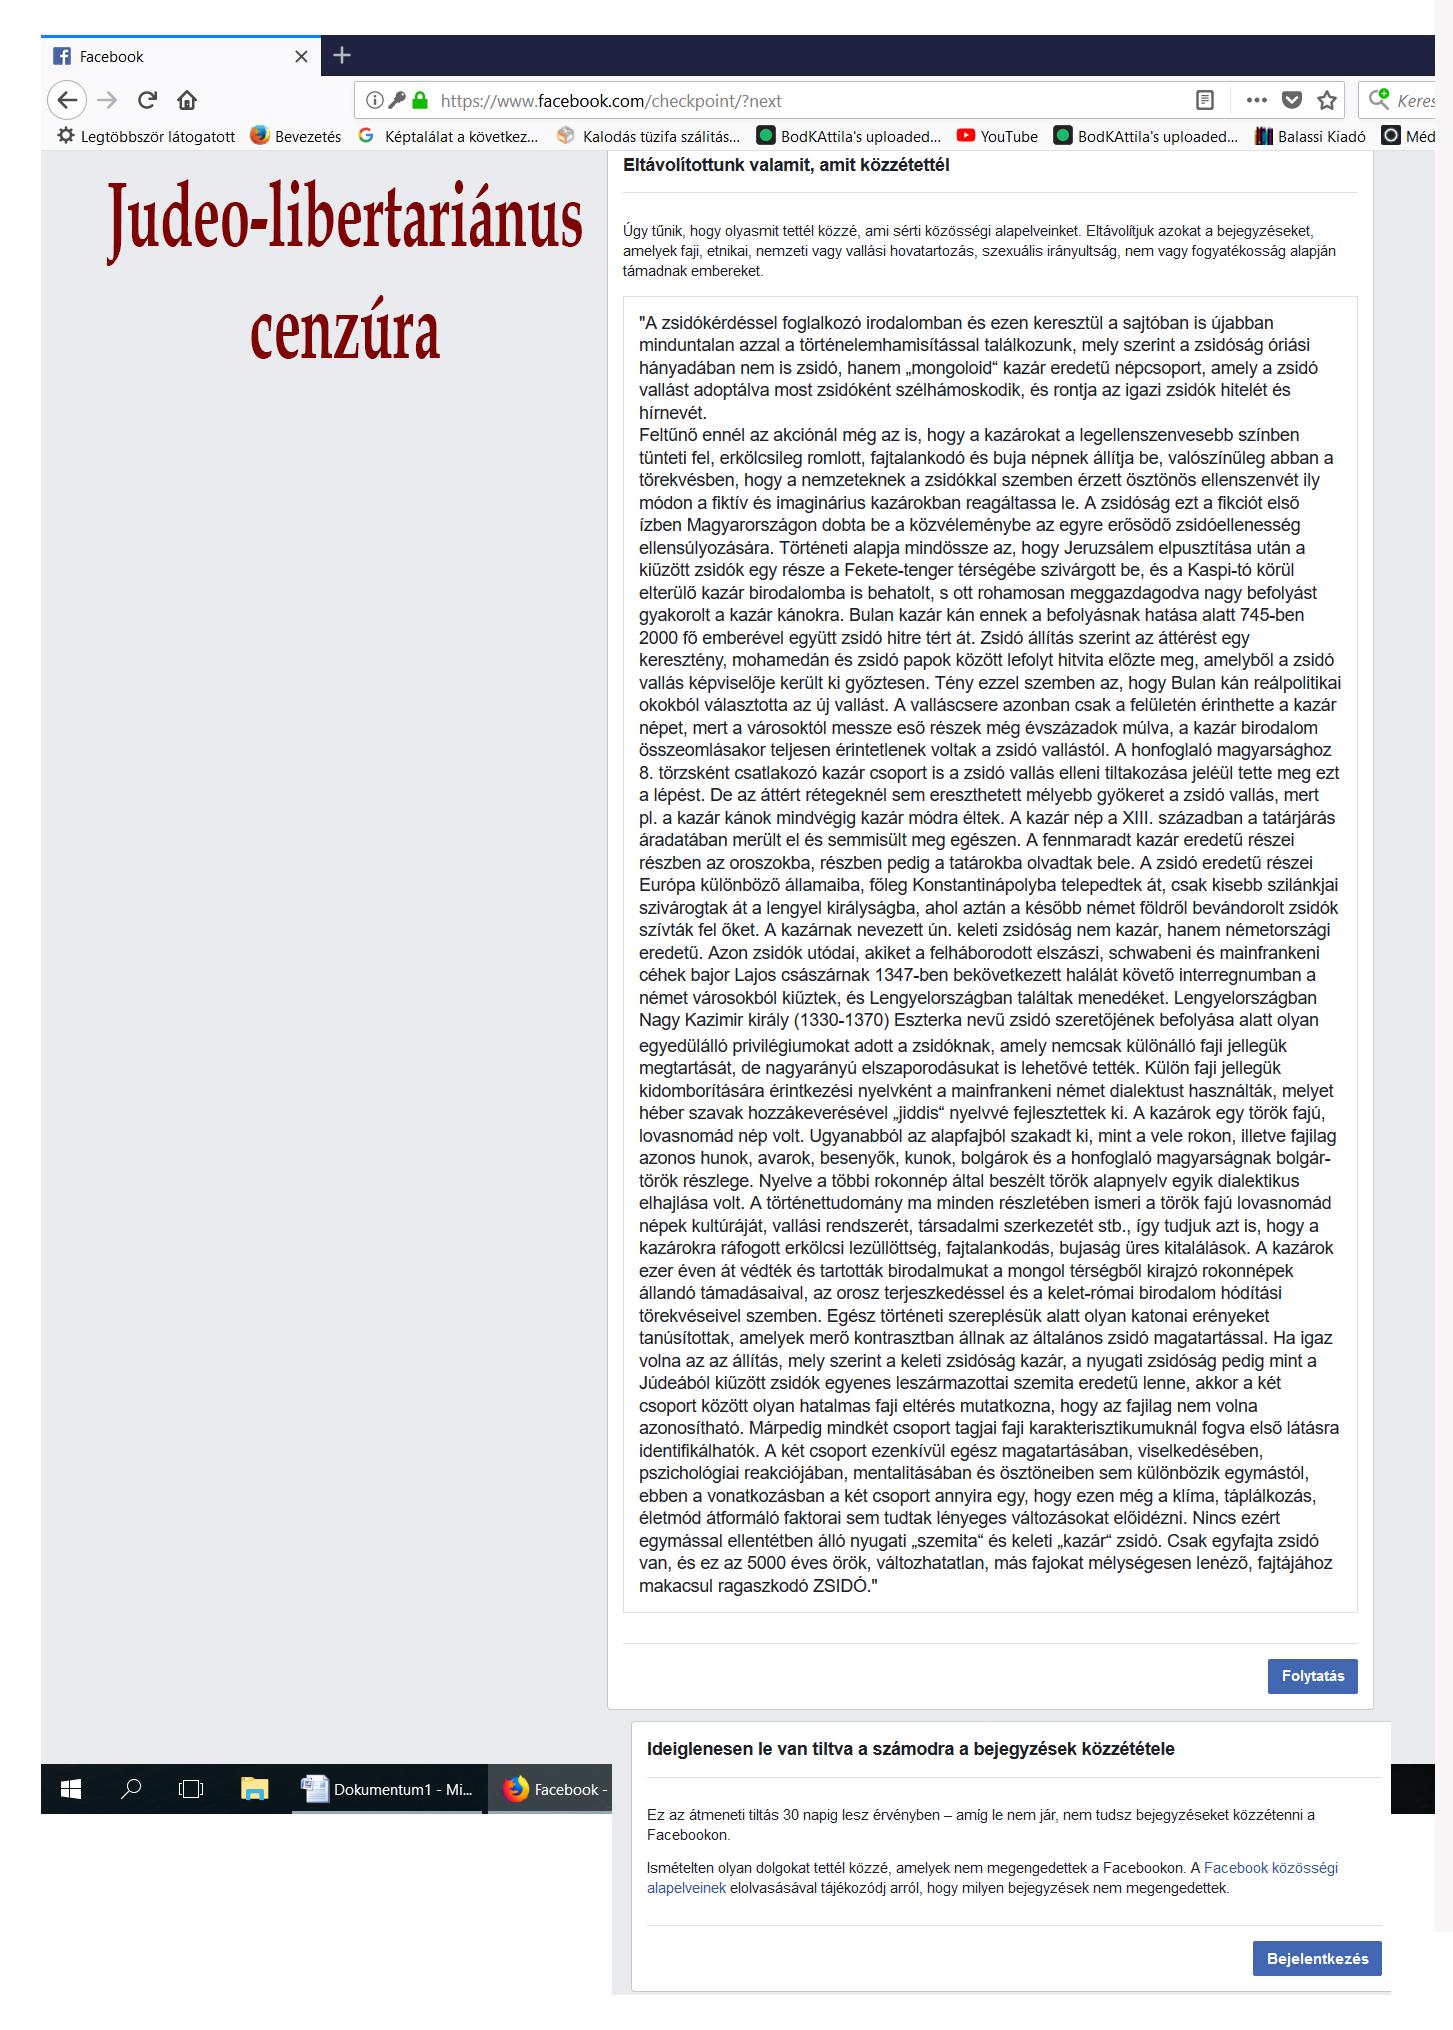 facebook_cenzura-7.jpg